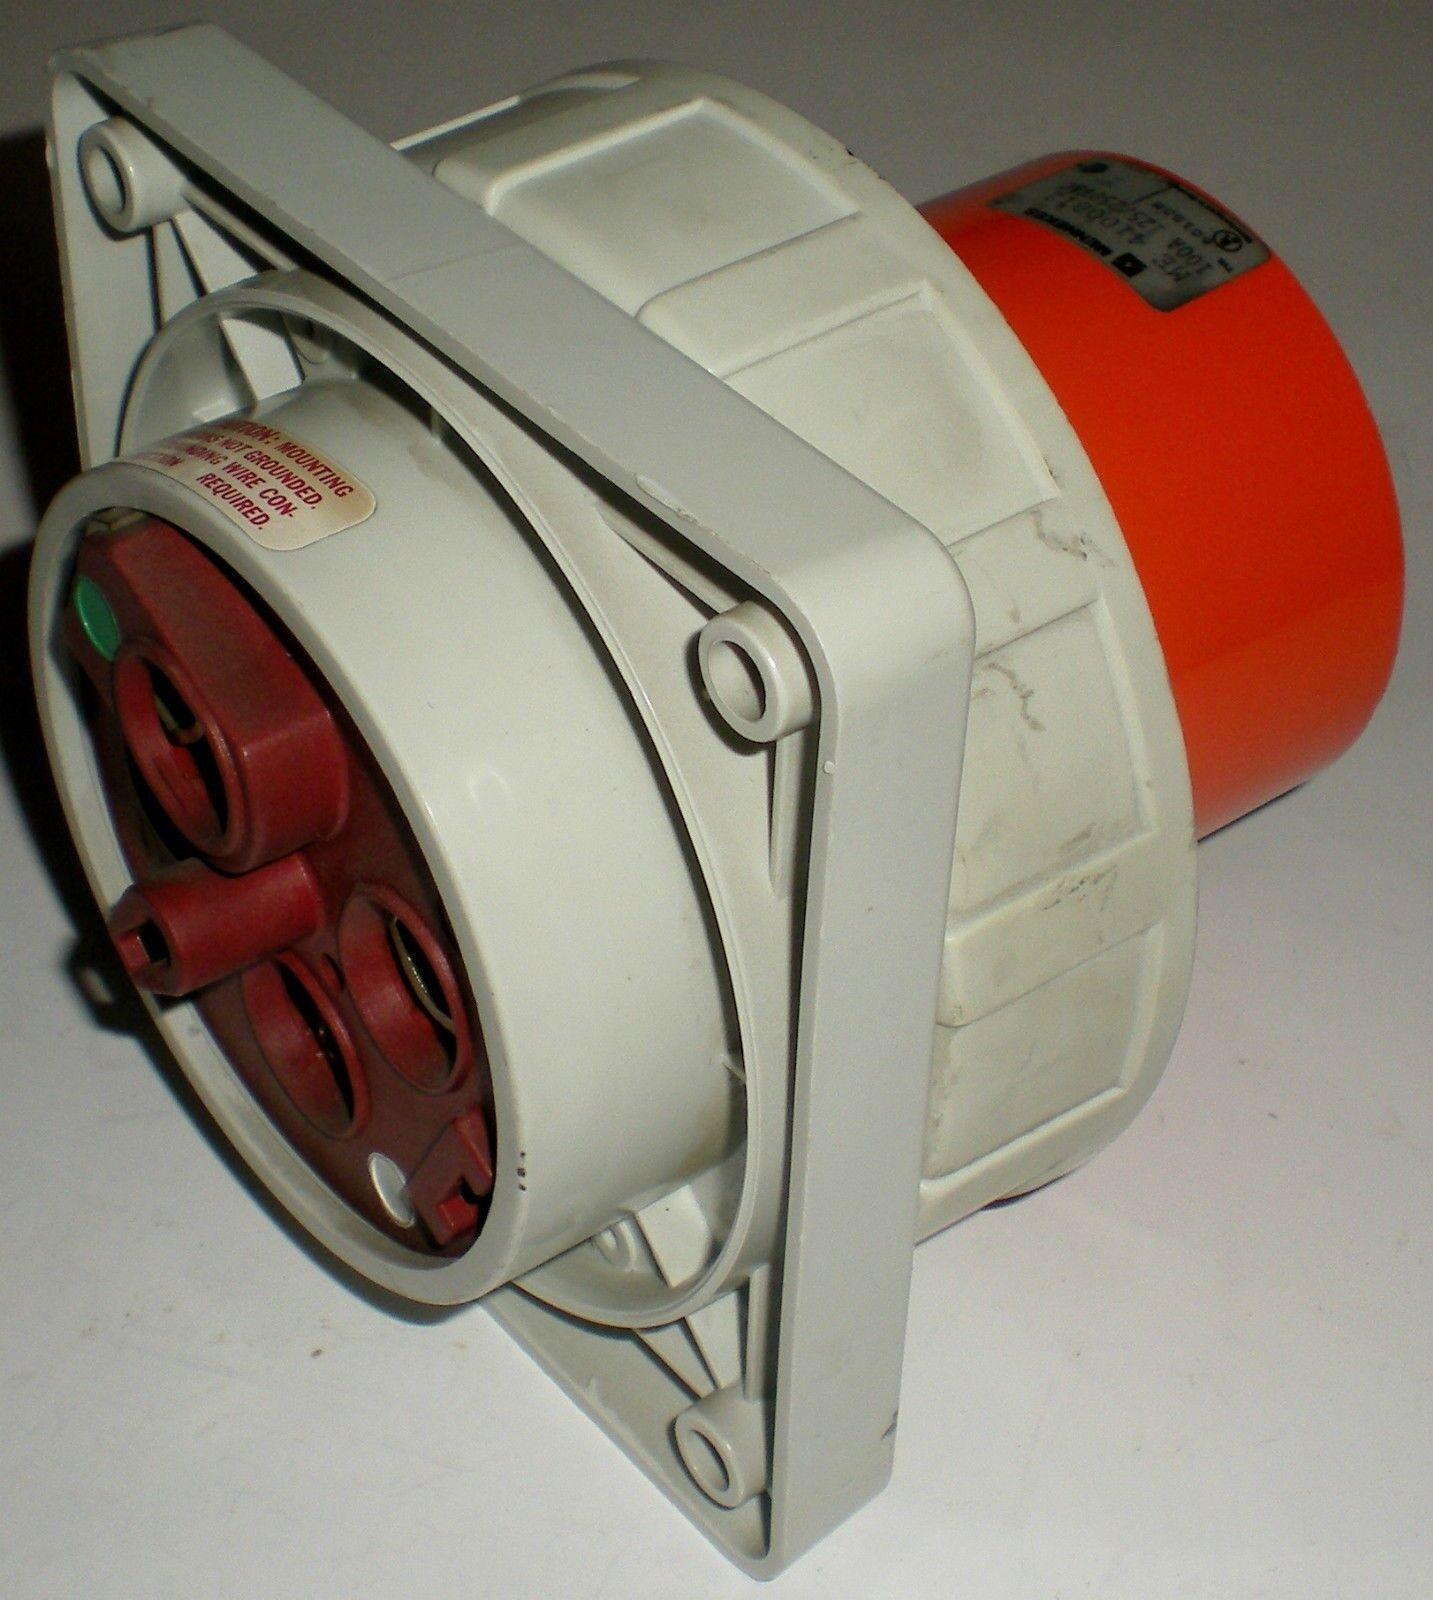 4100B12W  Mennekes 100A 4W 125//250V Inlet W//T  UL Listed  NSFP